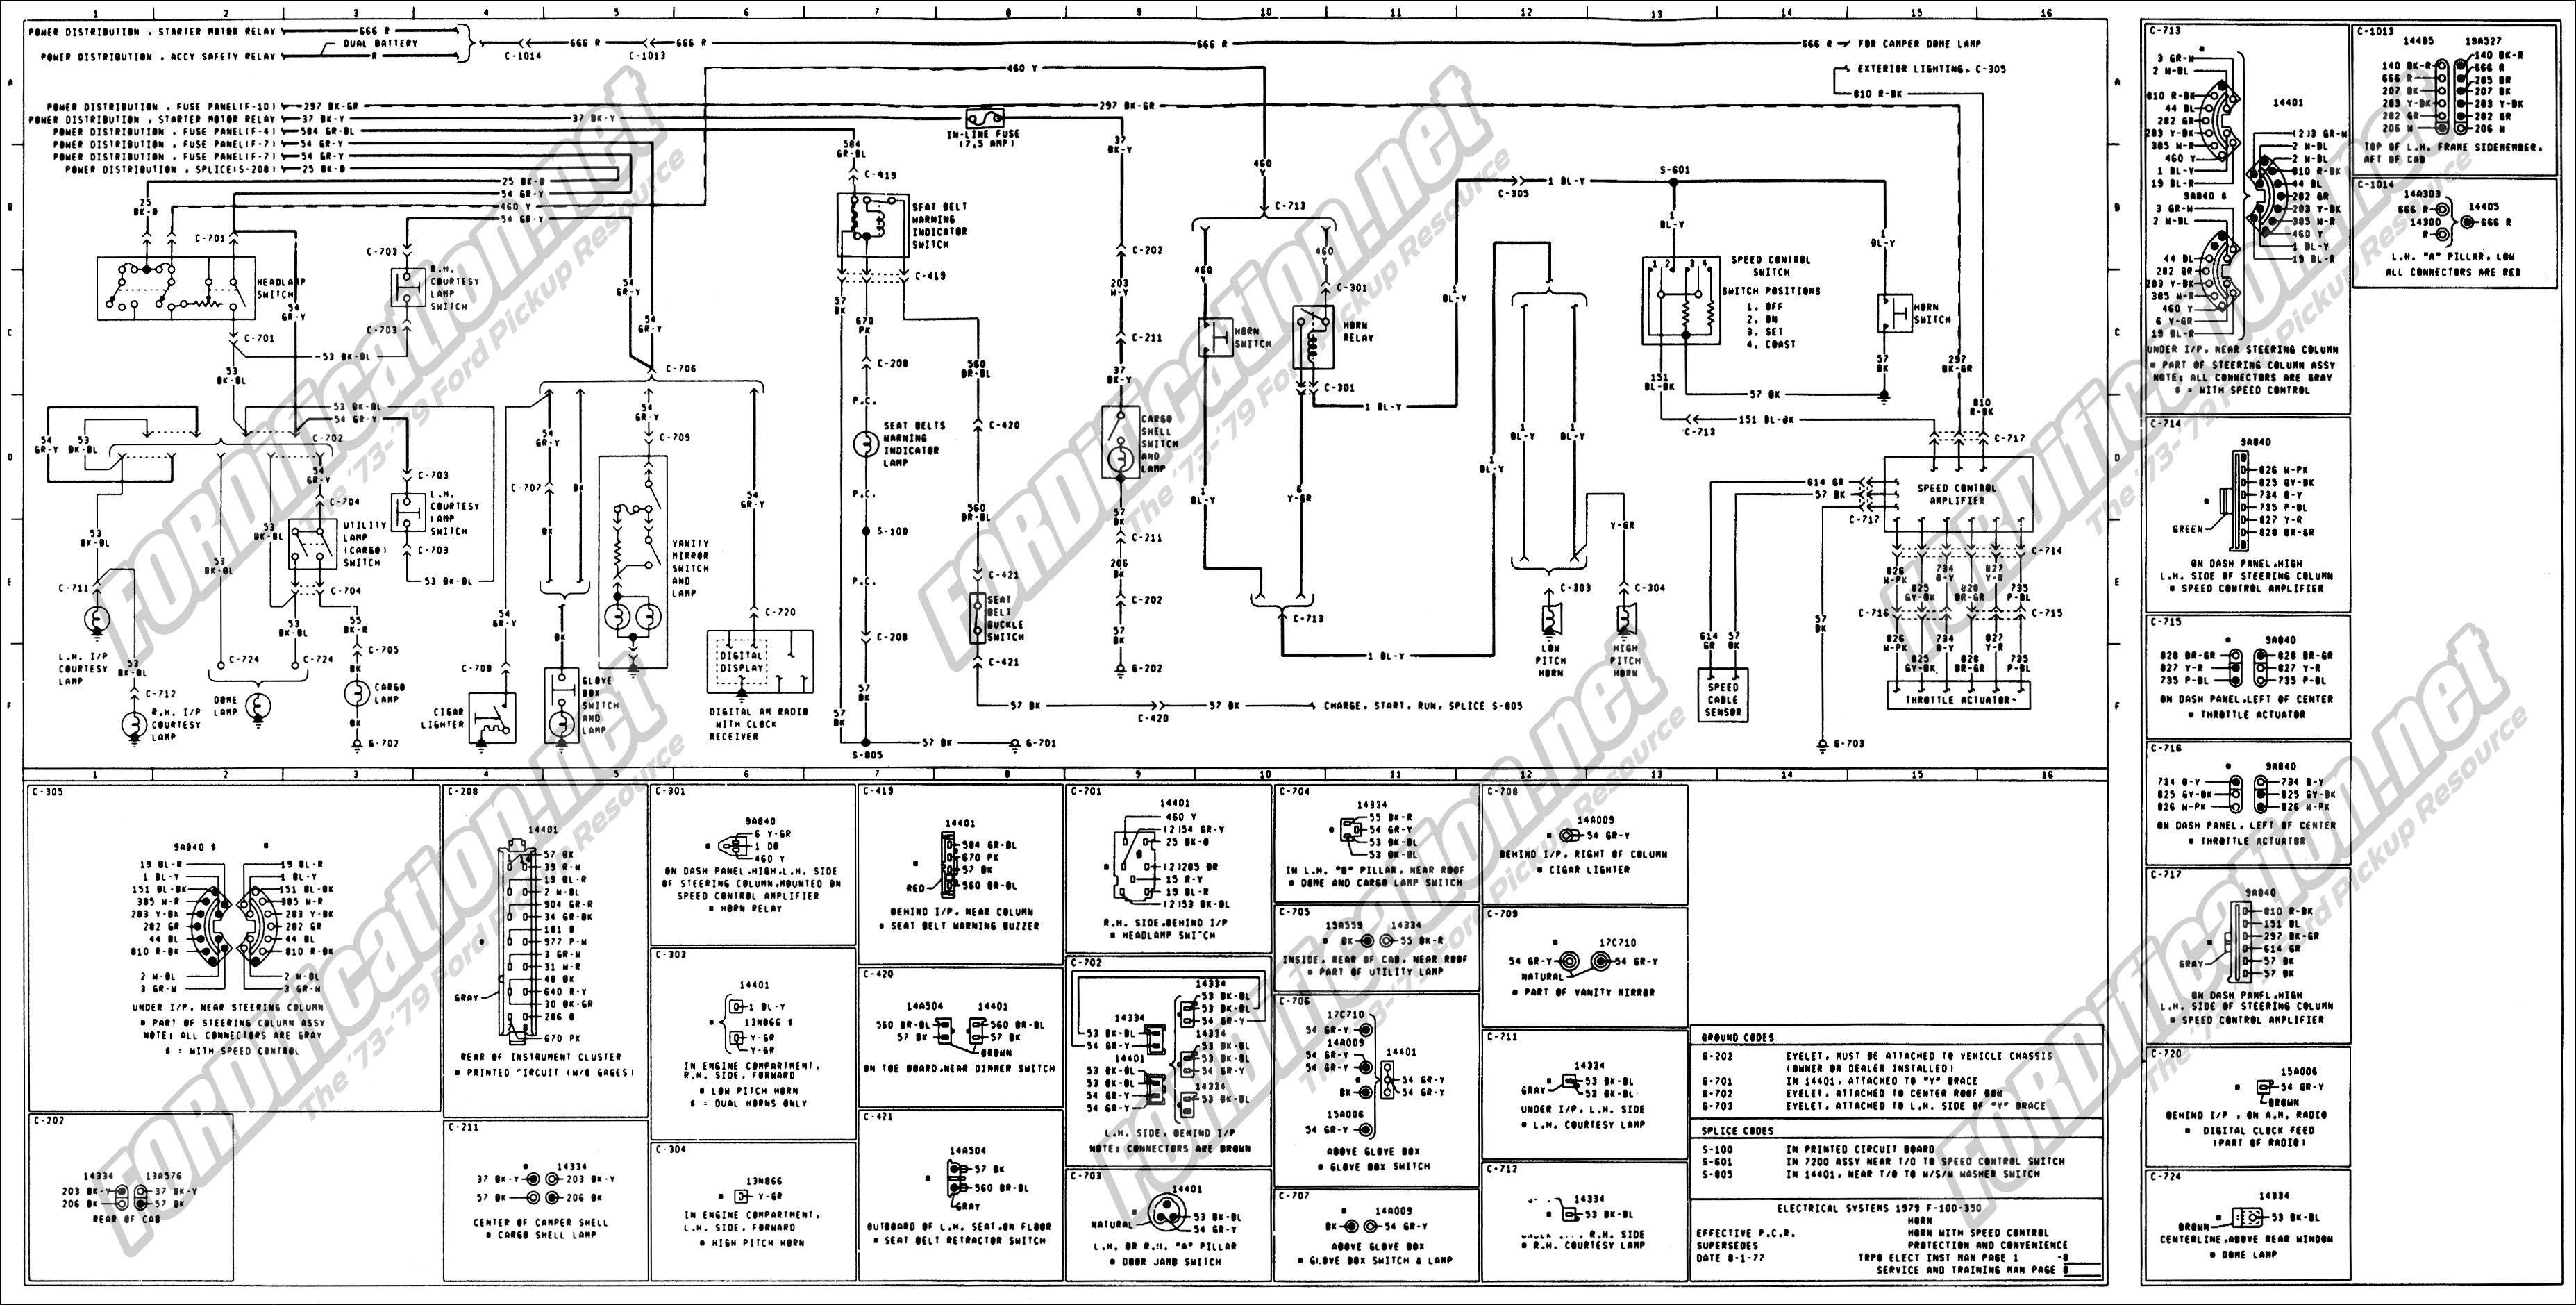 Ford Transit Custo Towbar Wiring Diagram - bookingritzcarlton.info | Ford  transit, Ford truck, DiagramPinterest